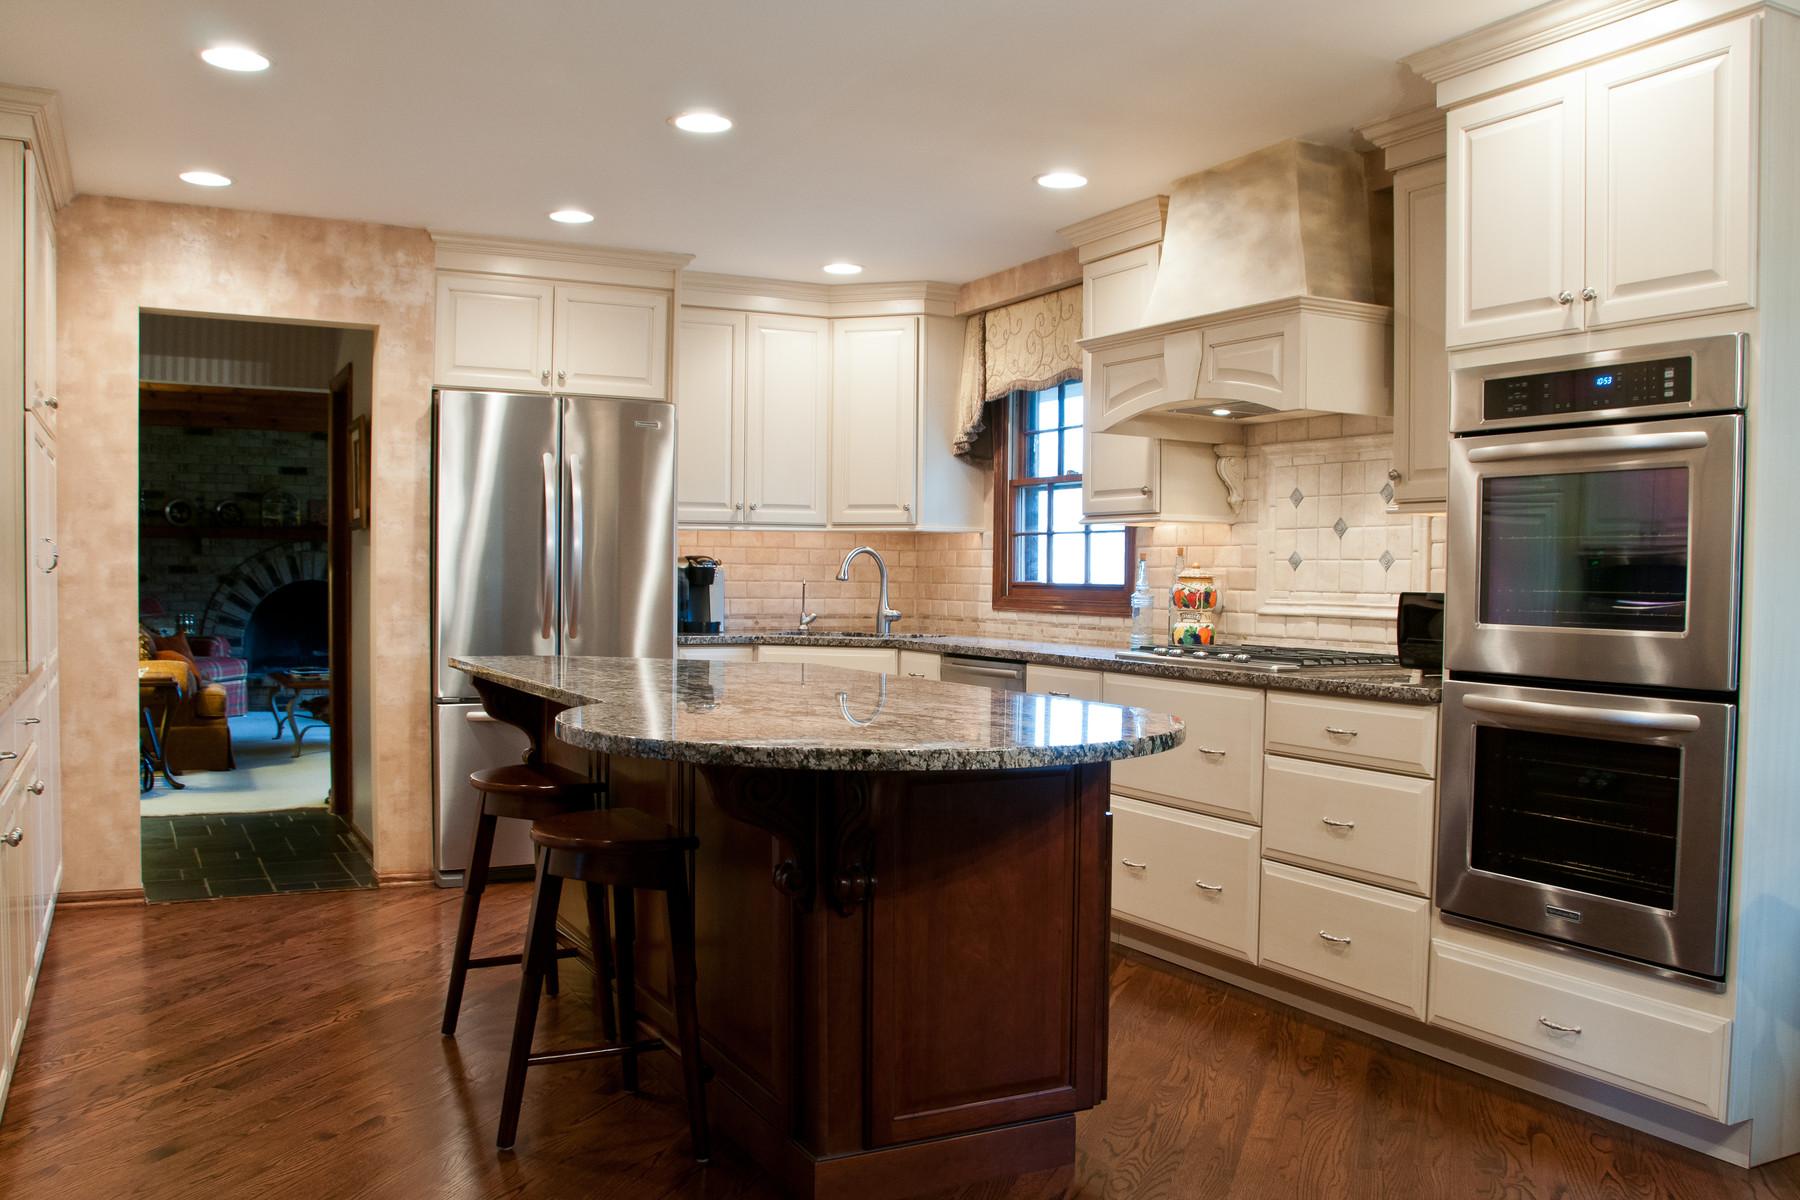 Kitchen Remodeling Gallery Naperville, Aurora, Wheaton - Part 3